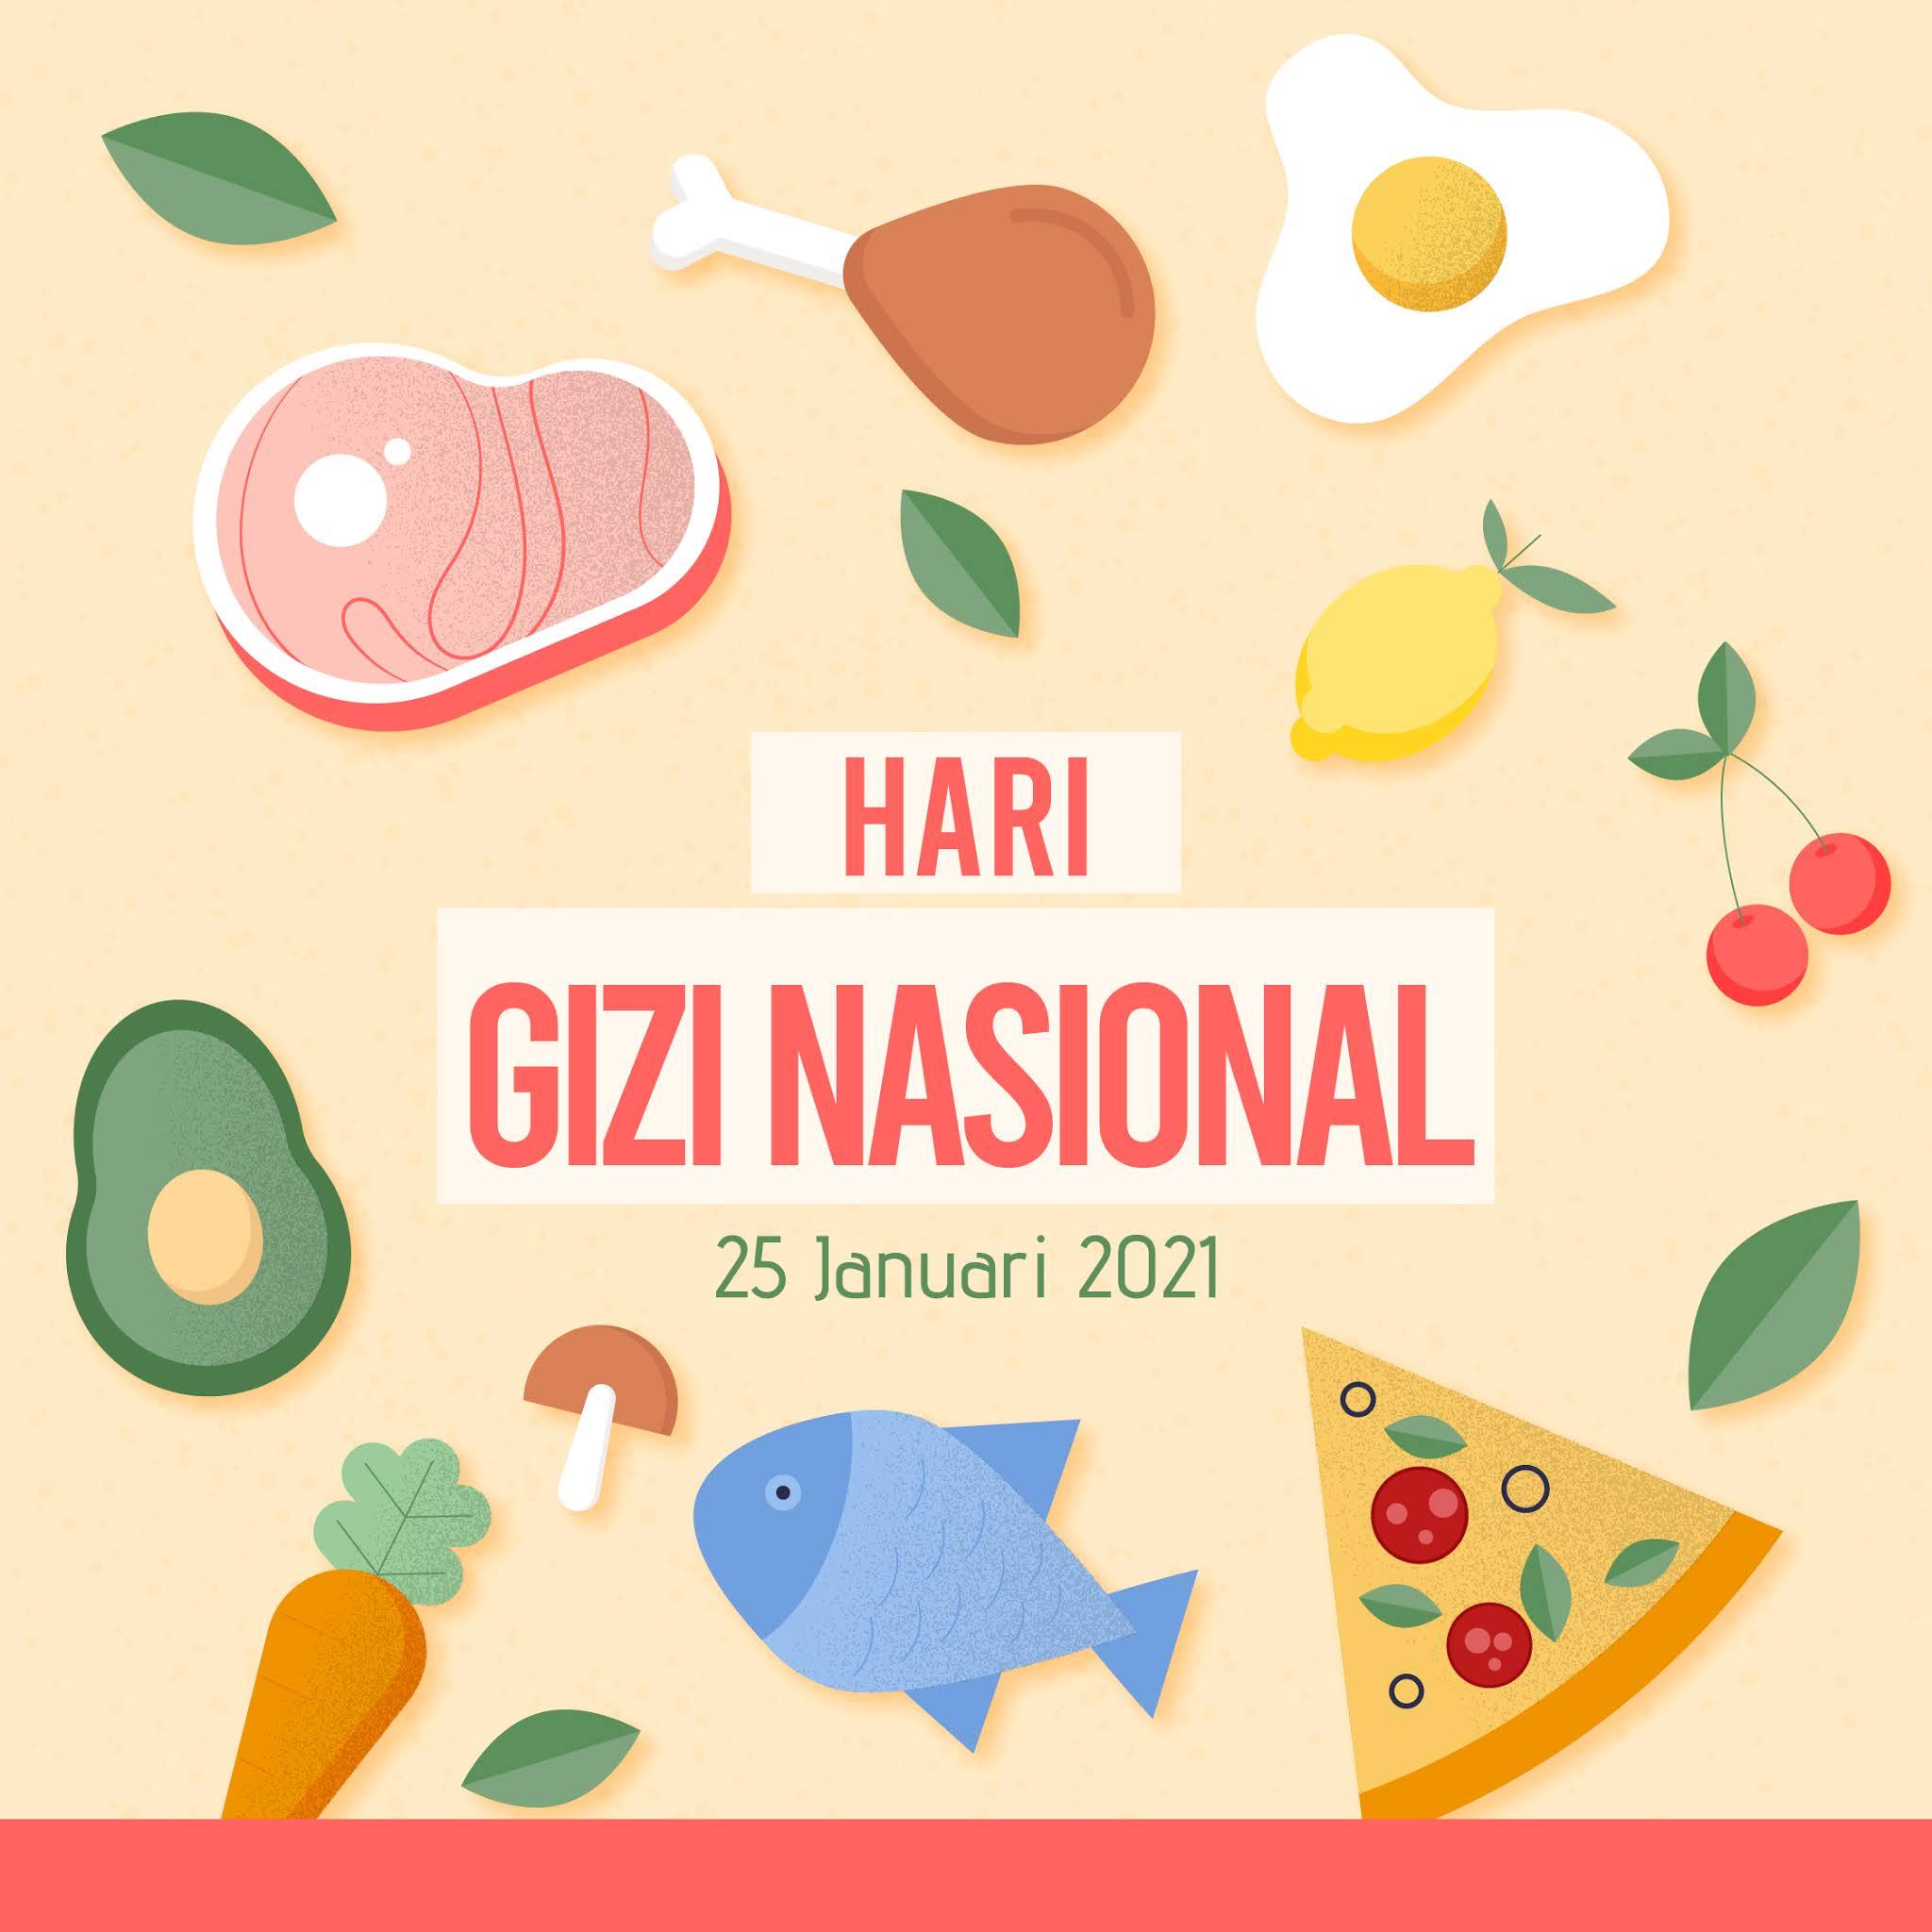 Kumpulan Gambar Desain Template Ucapan Selamat Hari Gizi Nasional